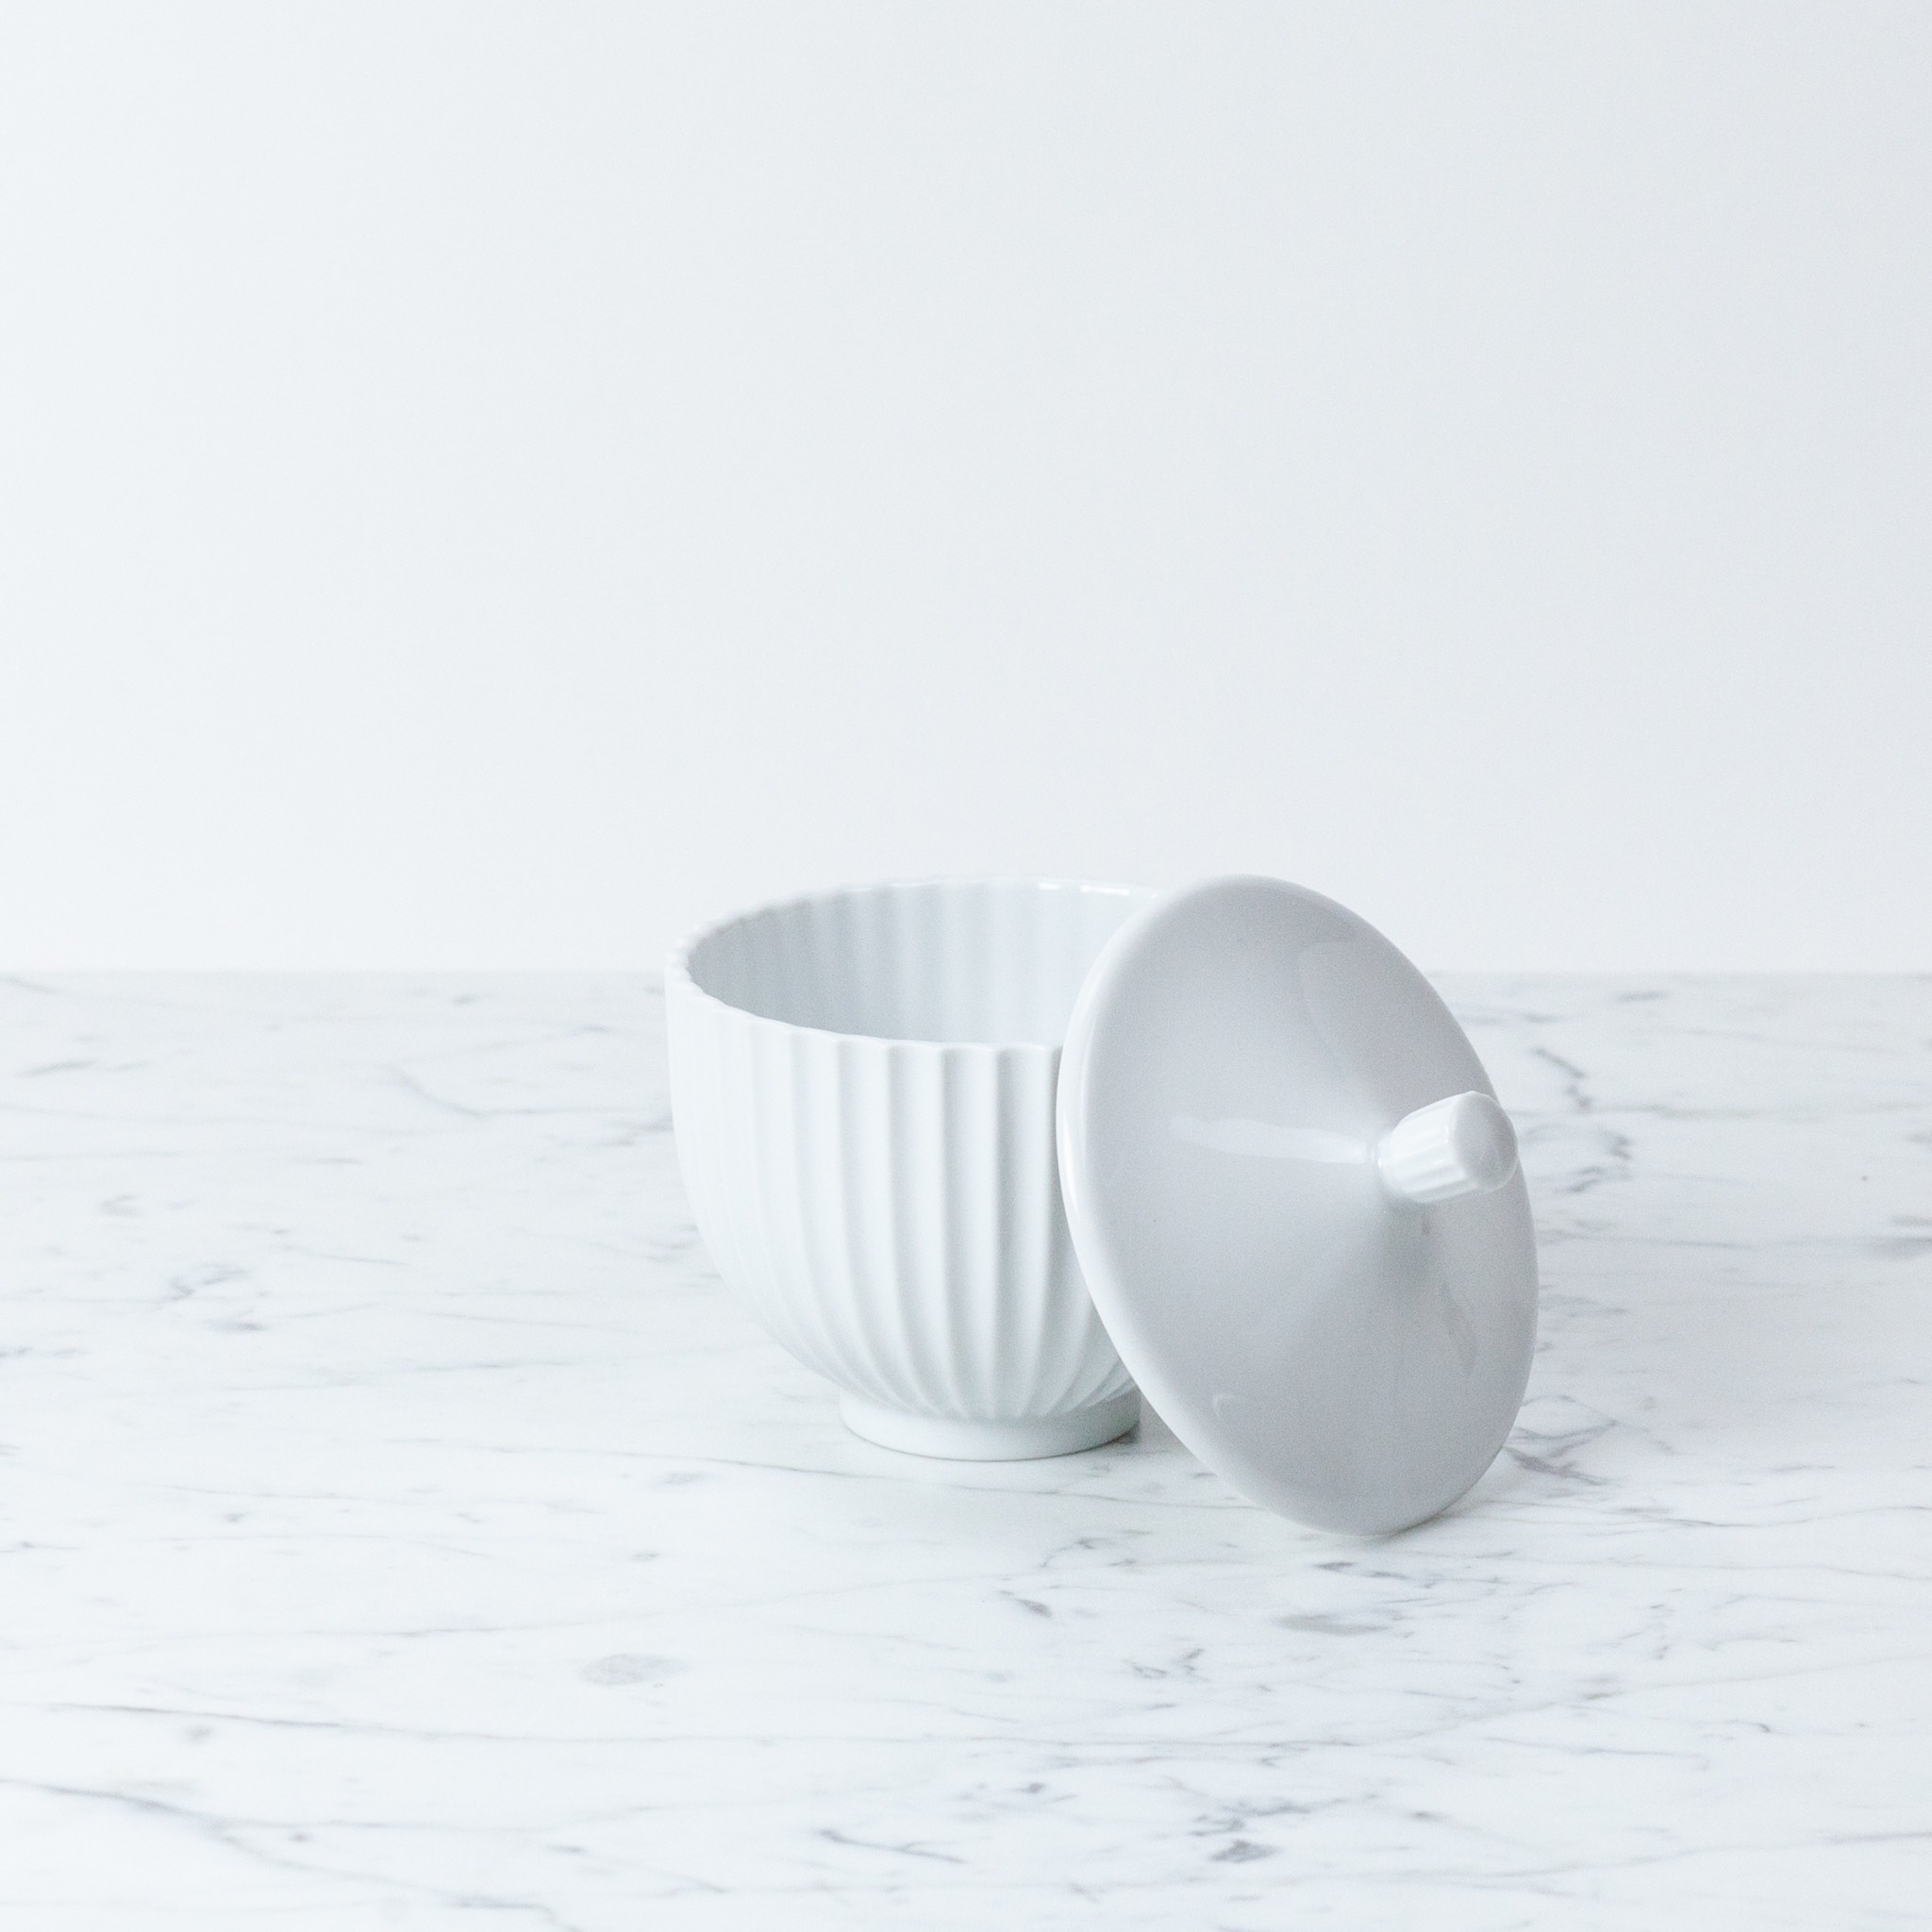 Lyngby Porcelain Lyngby Bonbonniere - 10 cm - White Porcelain